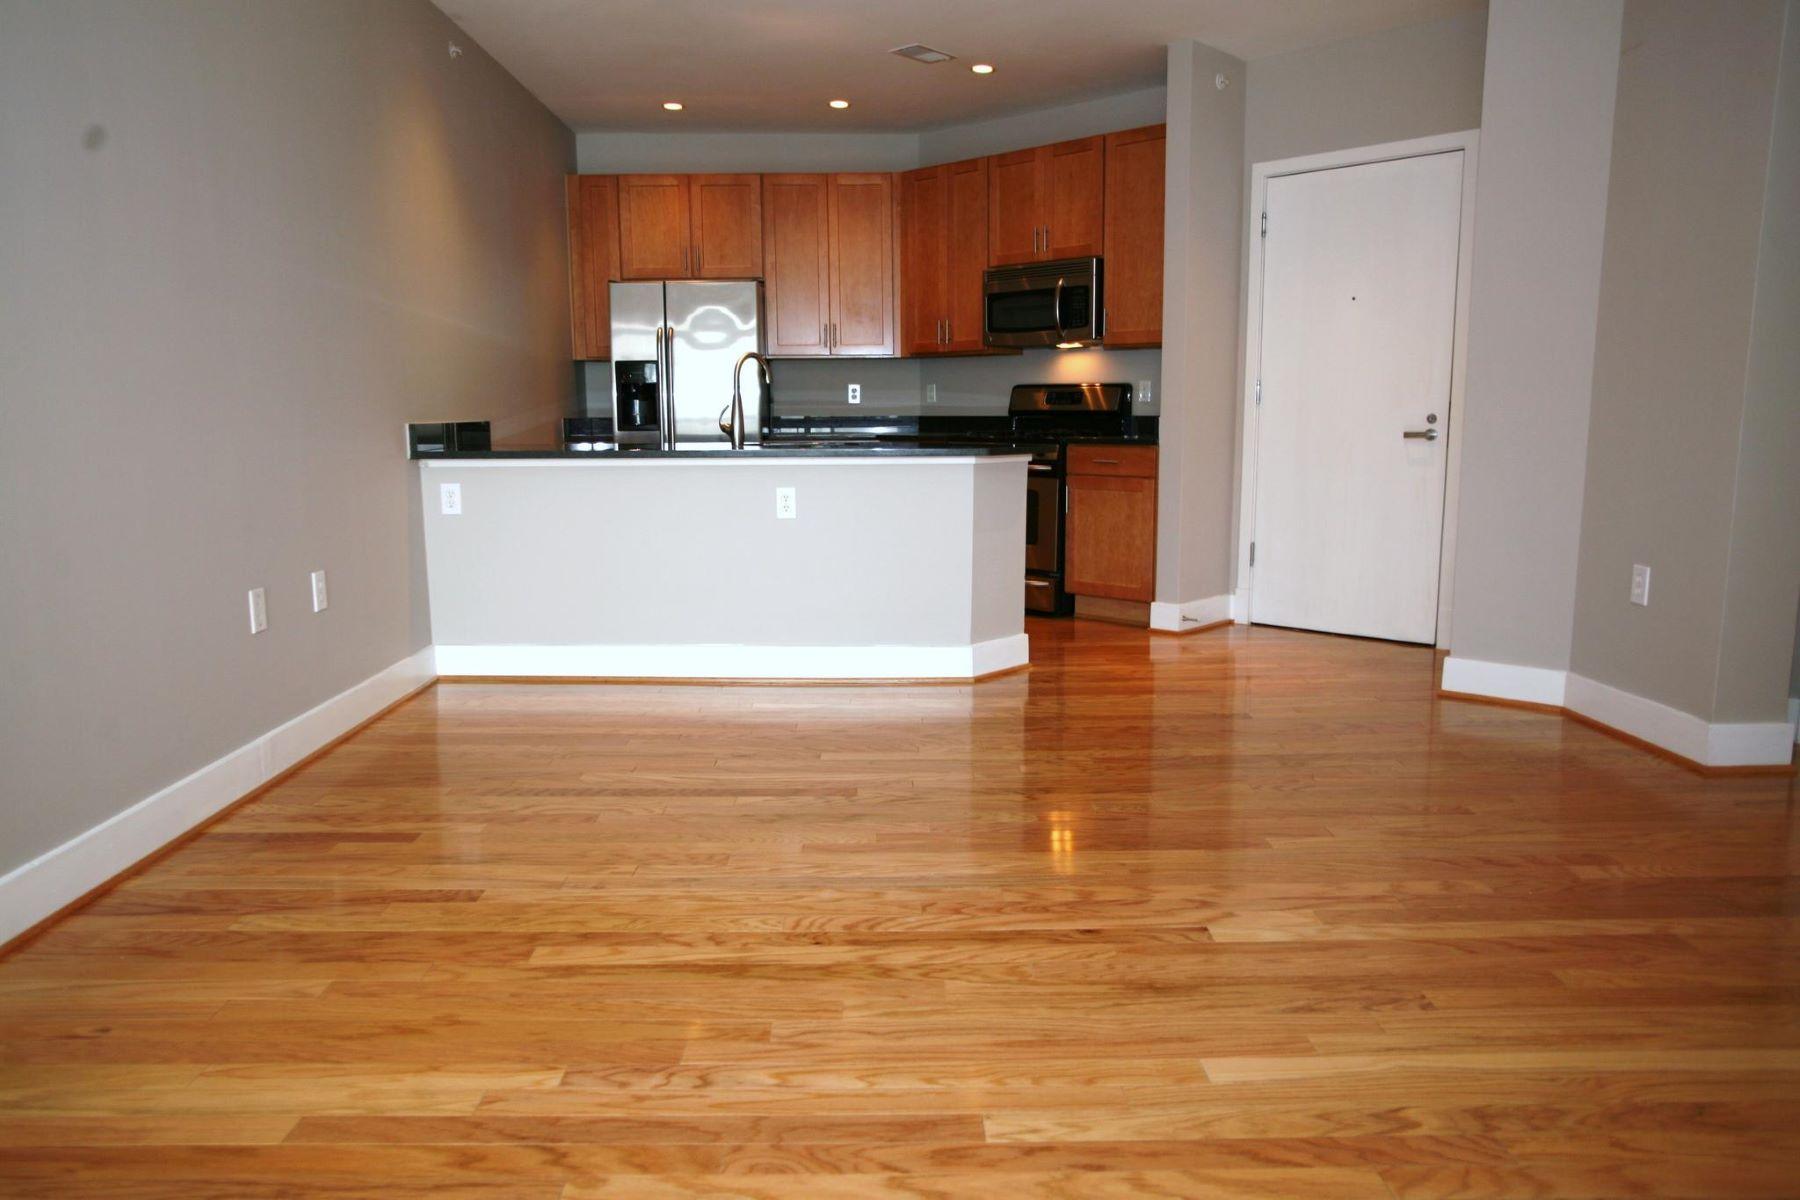 Additional photo for property listing at 1800 Wilson Blvd #431 1800 Wilson Blvd #431 Arlington, Virginia 22201 United States